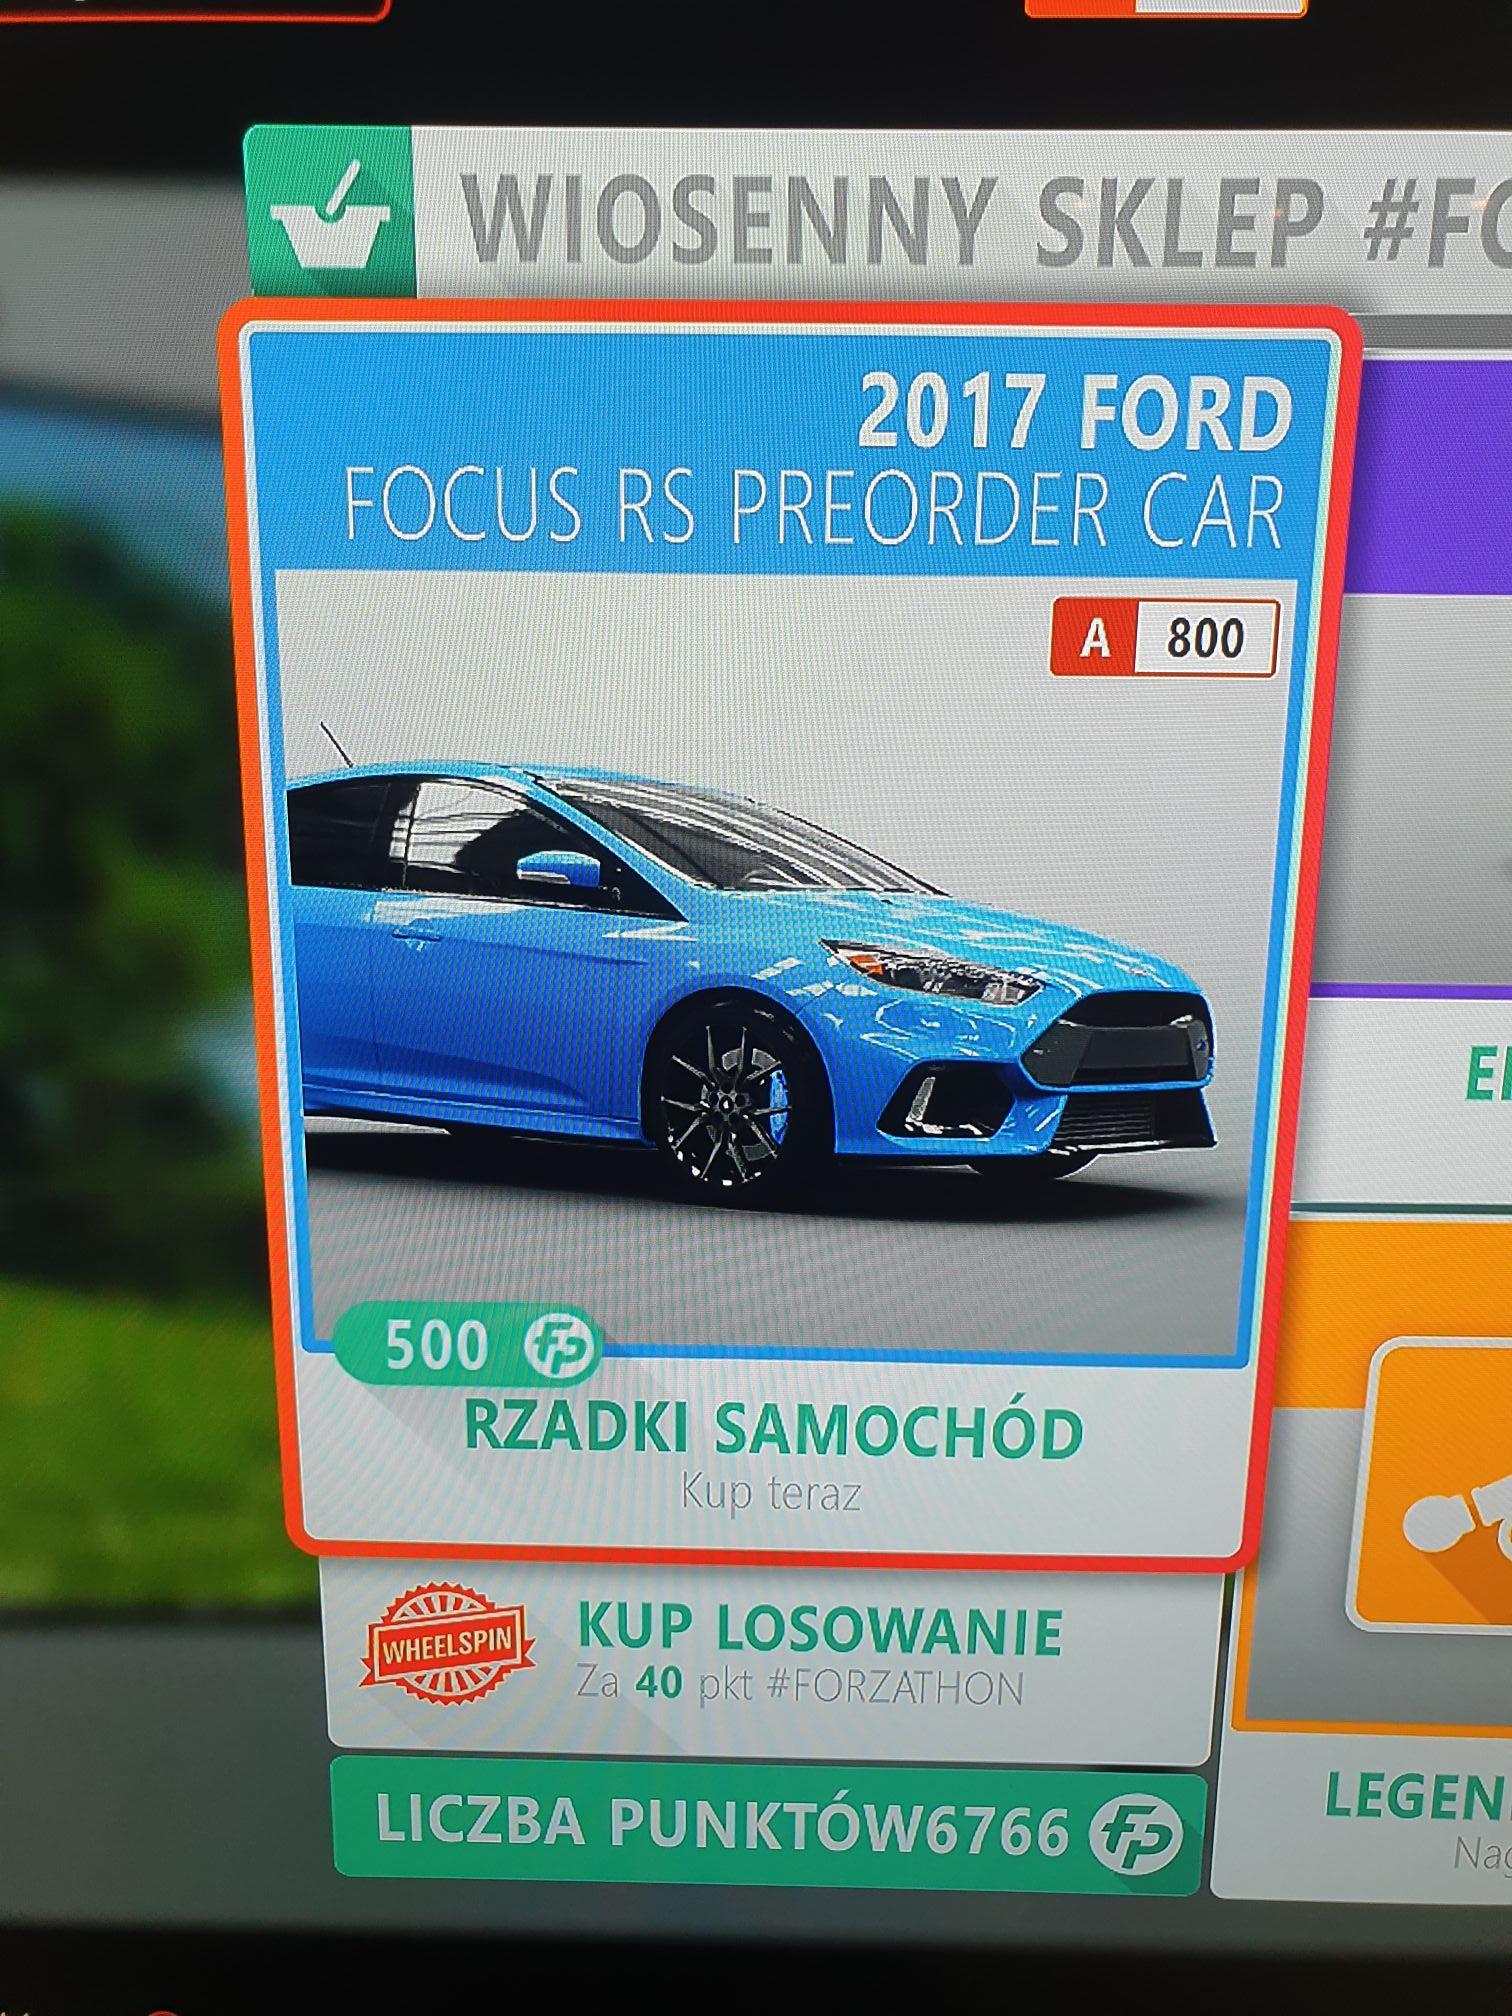 Forza Horizon 4 - Focus RS PREORDER CAR - 500 Forza Points